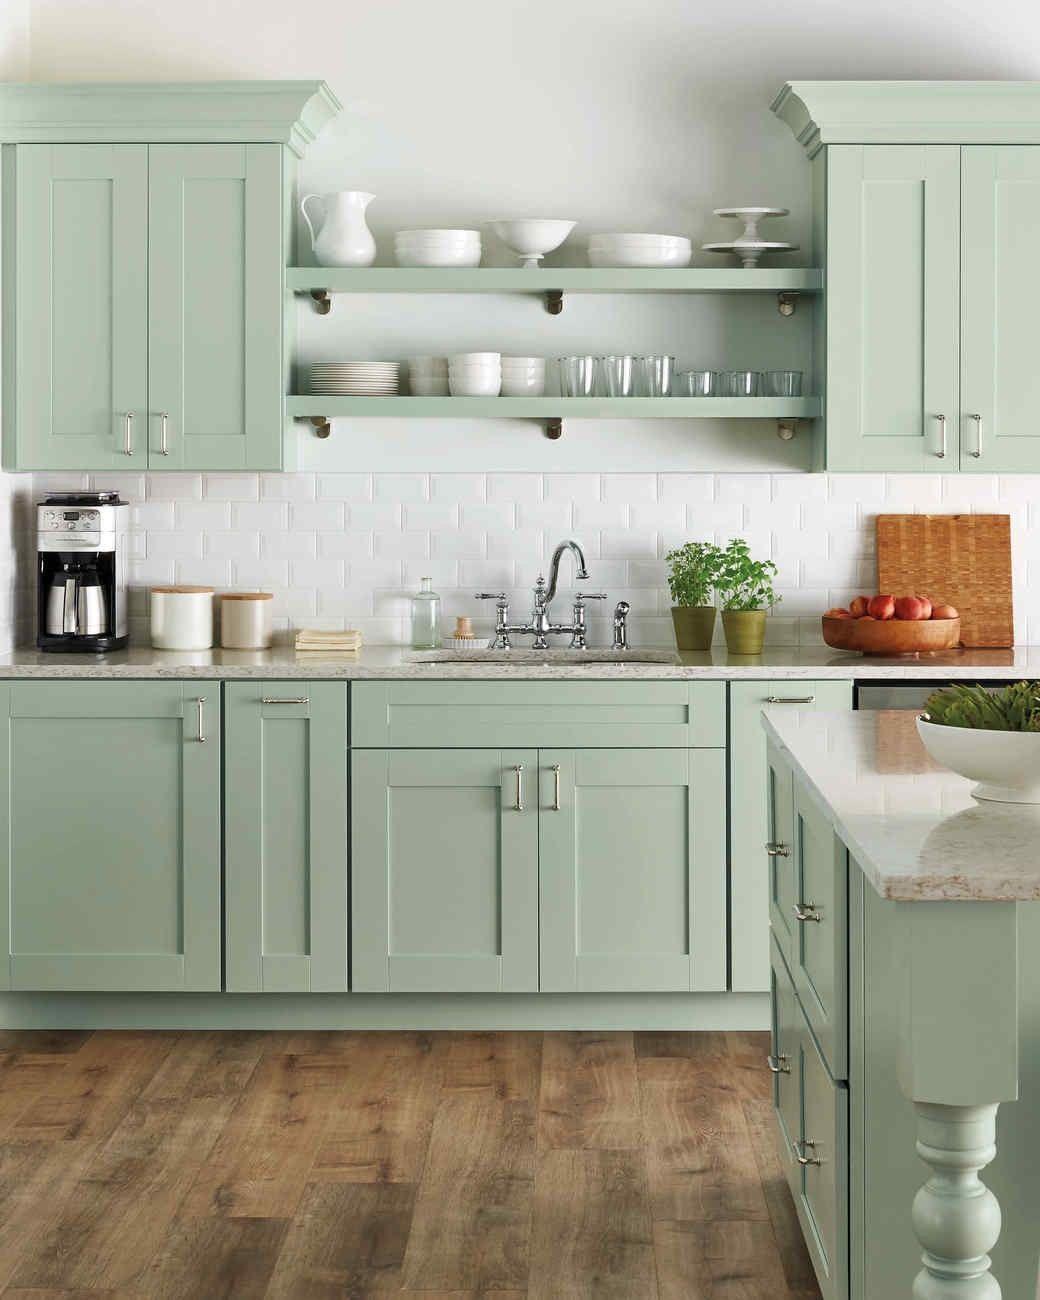 Home Depot Design Ideas: Home Depot Kitchen, Cottage